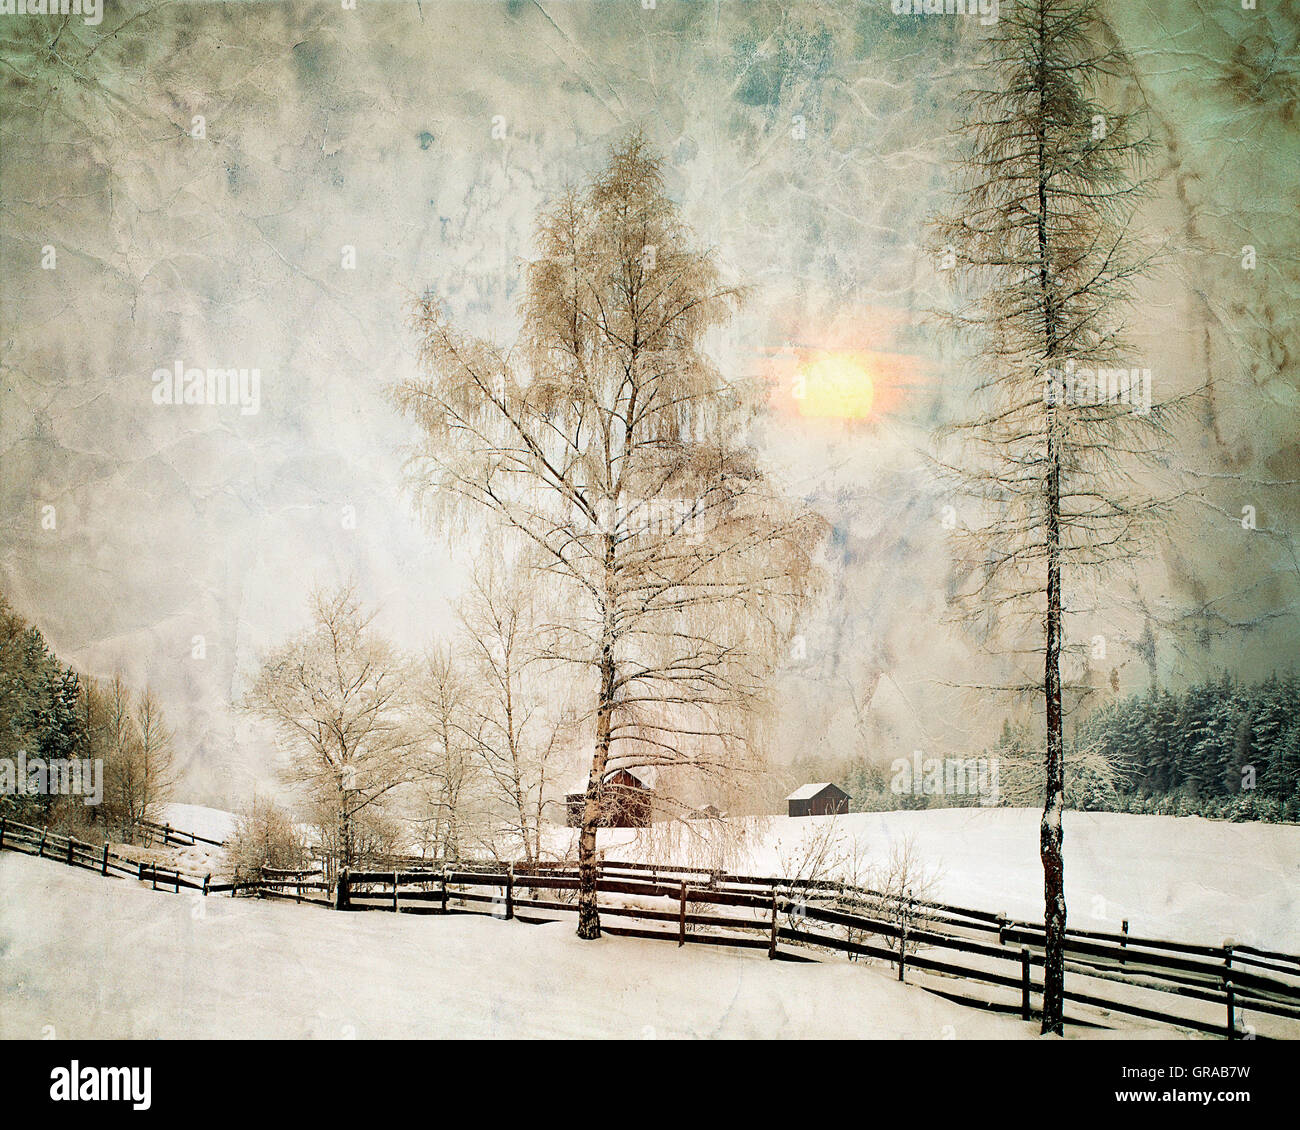 DIGITAL ART: Winterscene near Obernberg, Tyrol, Austria Stock Photo